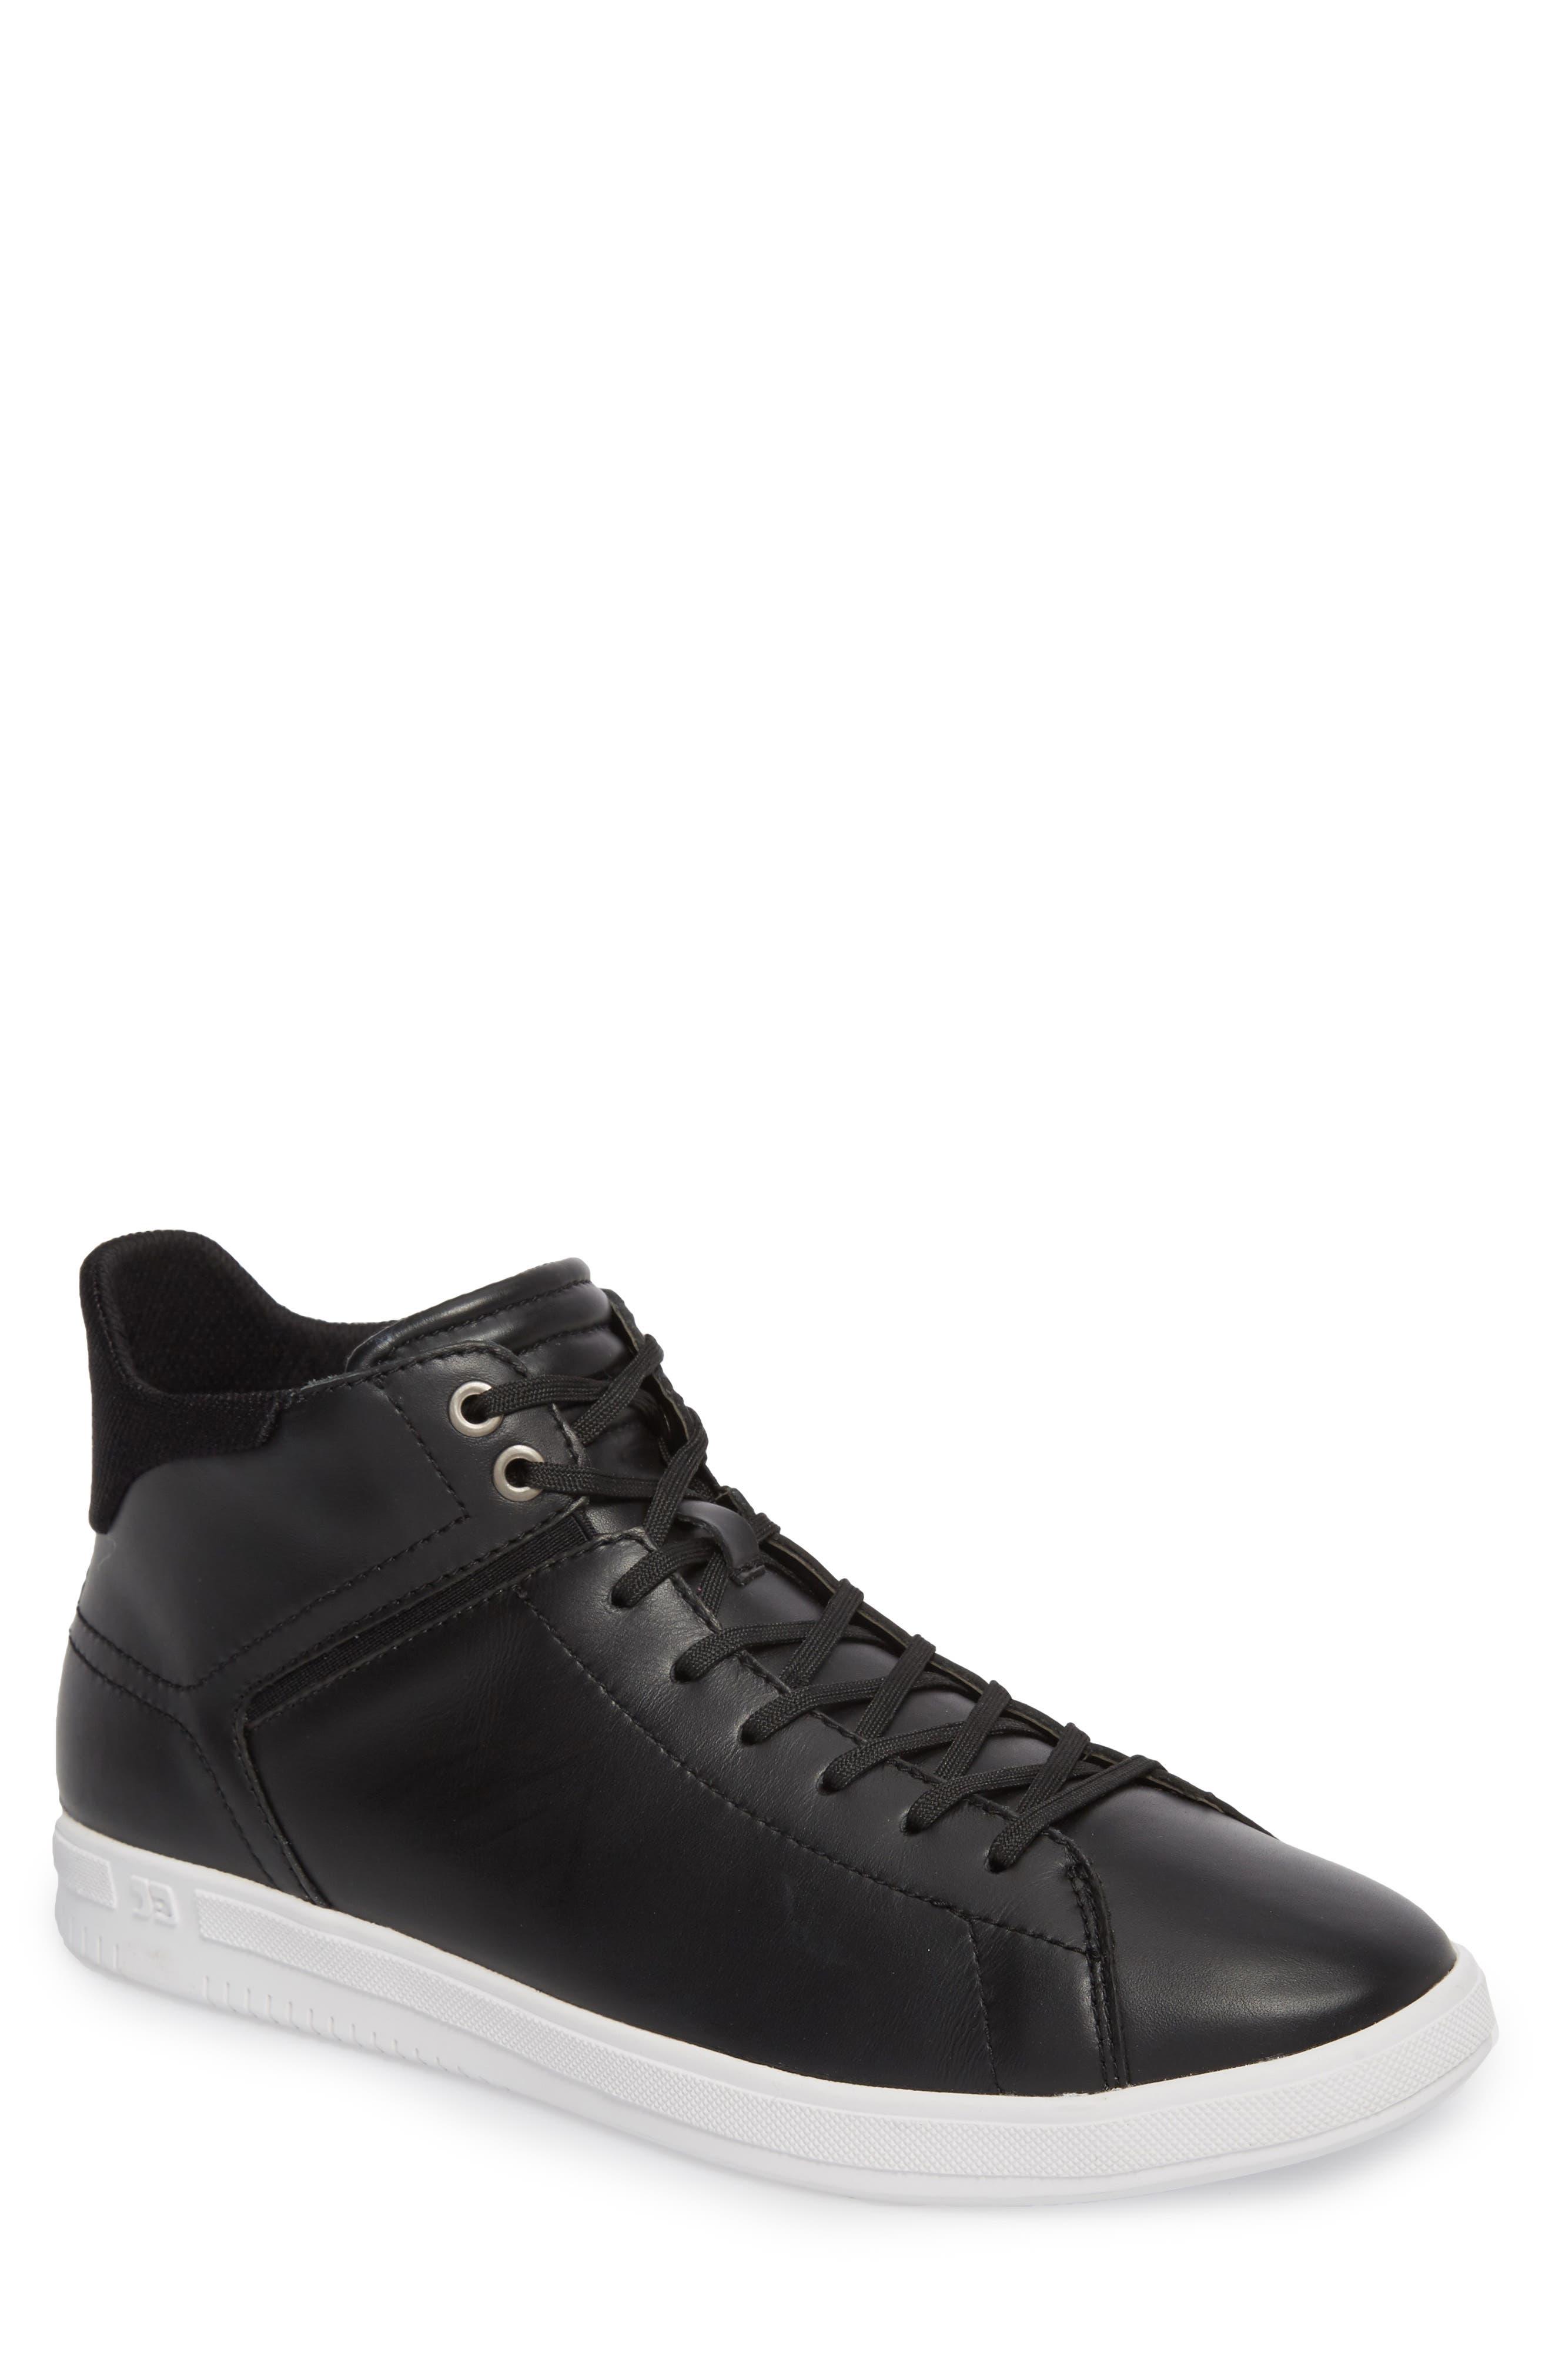 Joe Z Mid Top Sneaker,                             Main thumbnail 1, color,                             Black Leather